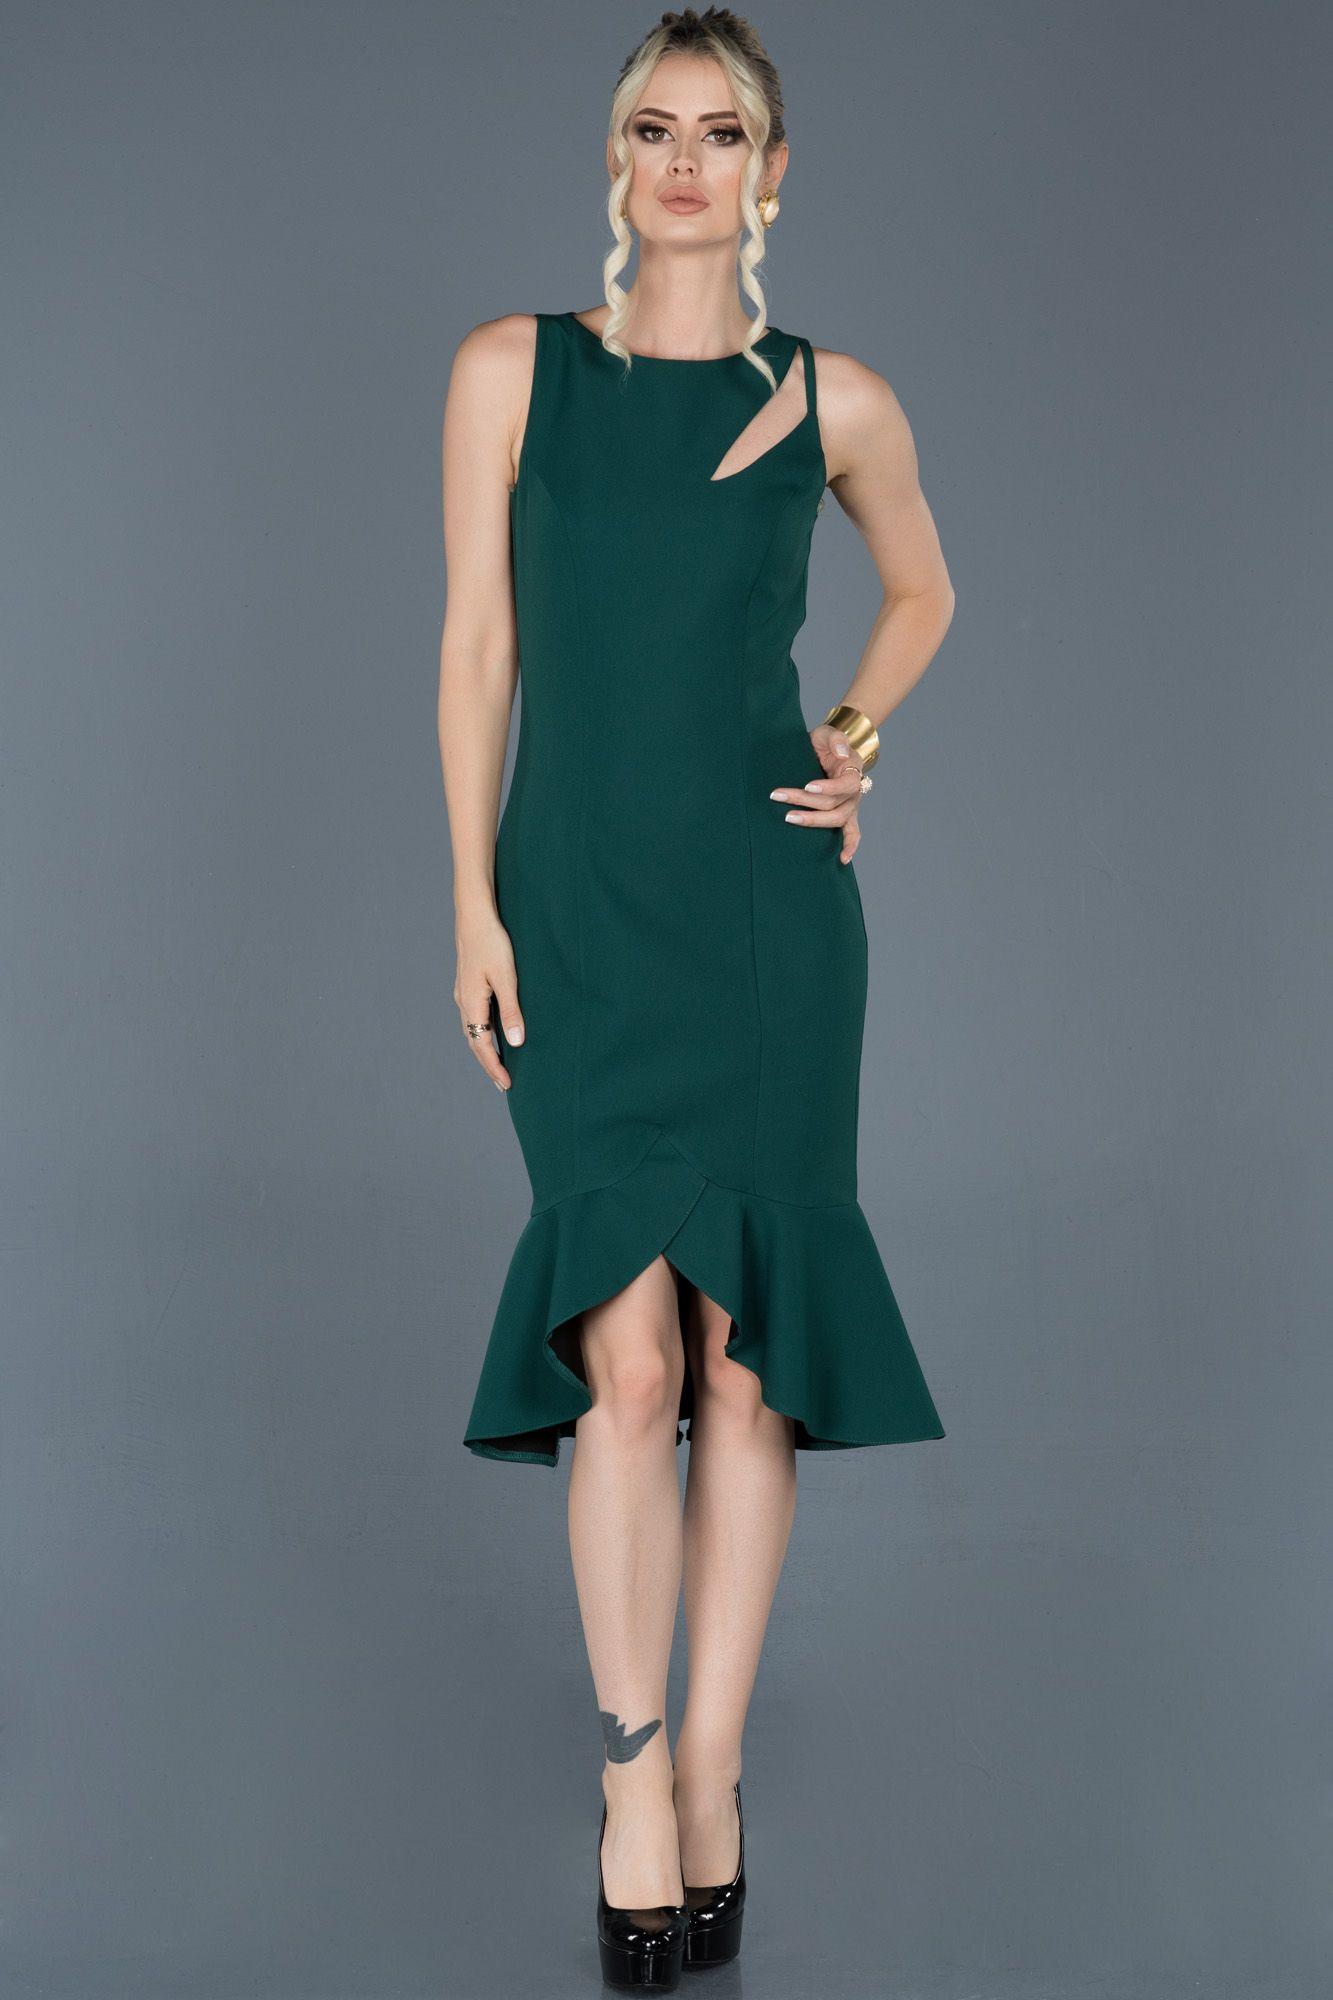 Zumrut Yesili Midi Davet Elbisesi Abk509 2020 Elbise Modelleri The Dress Elbise